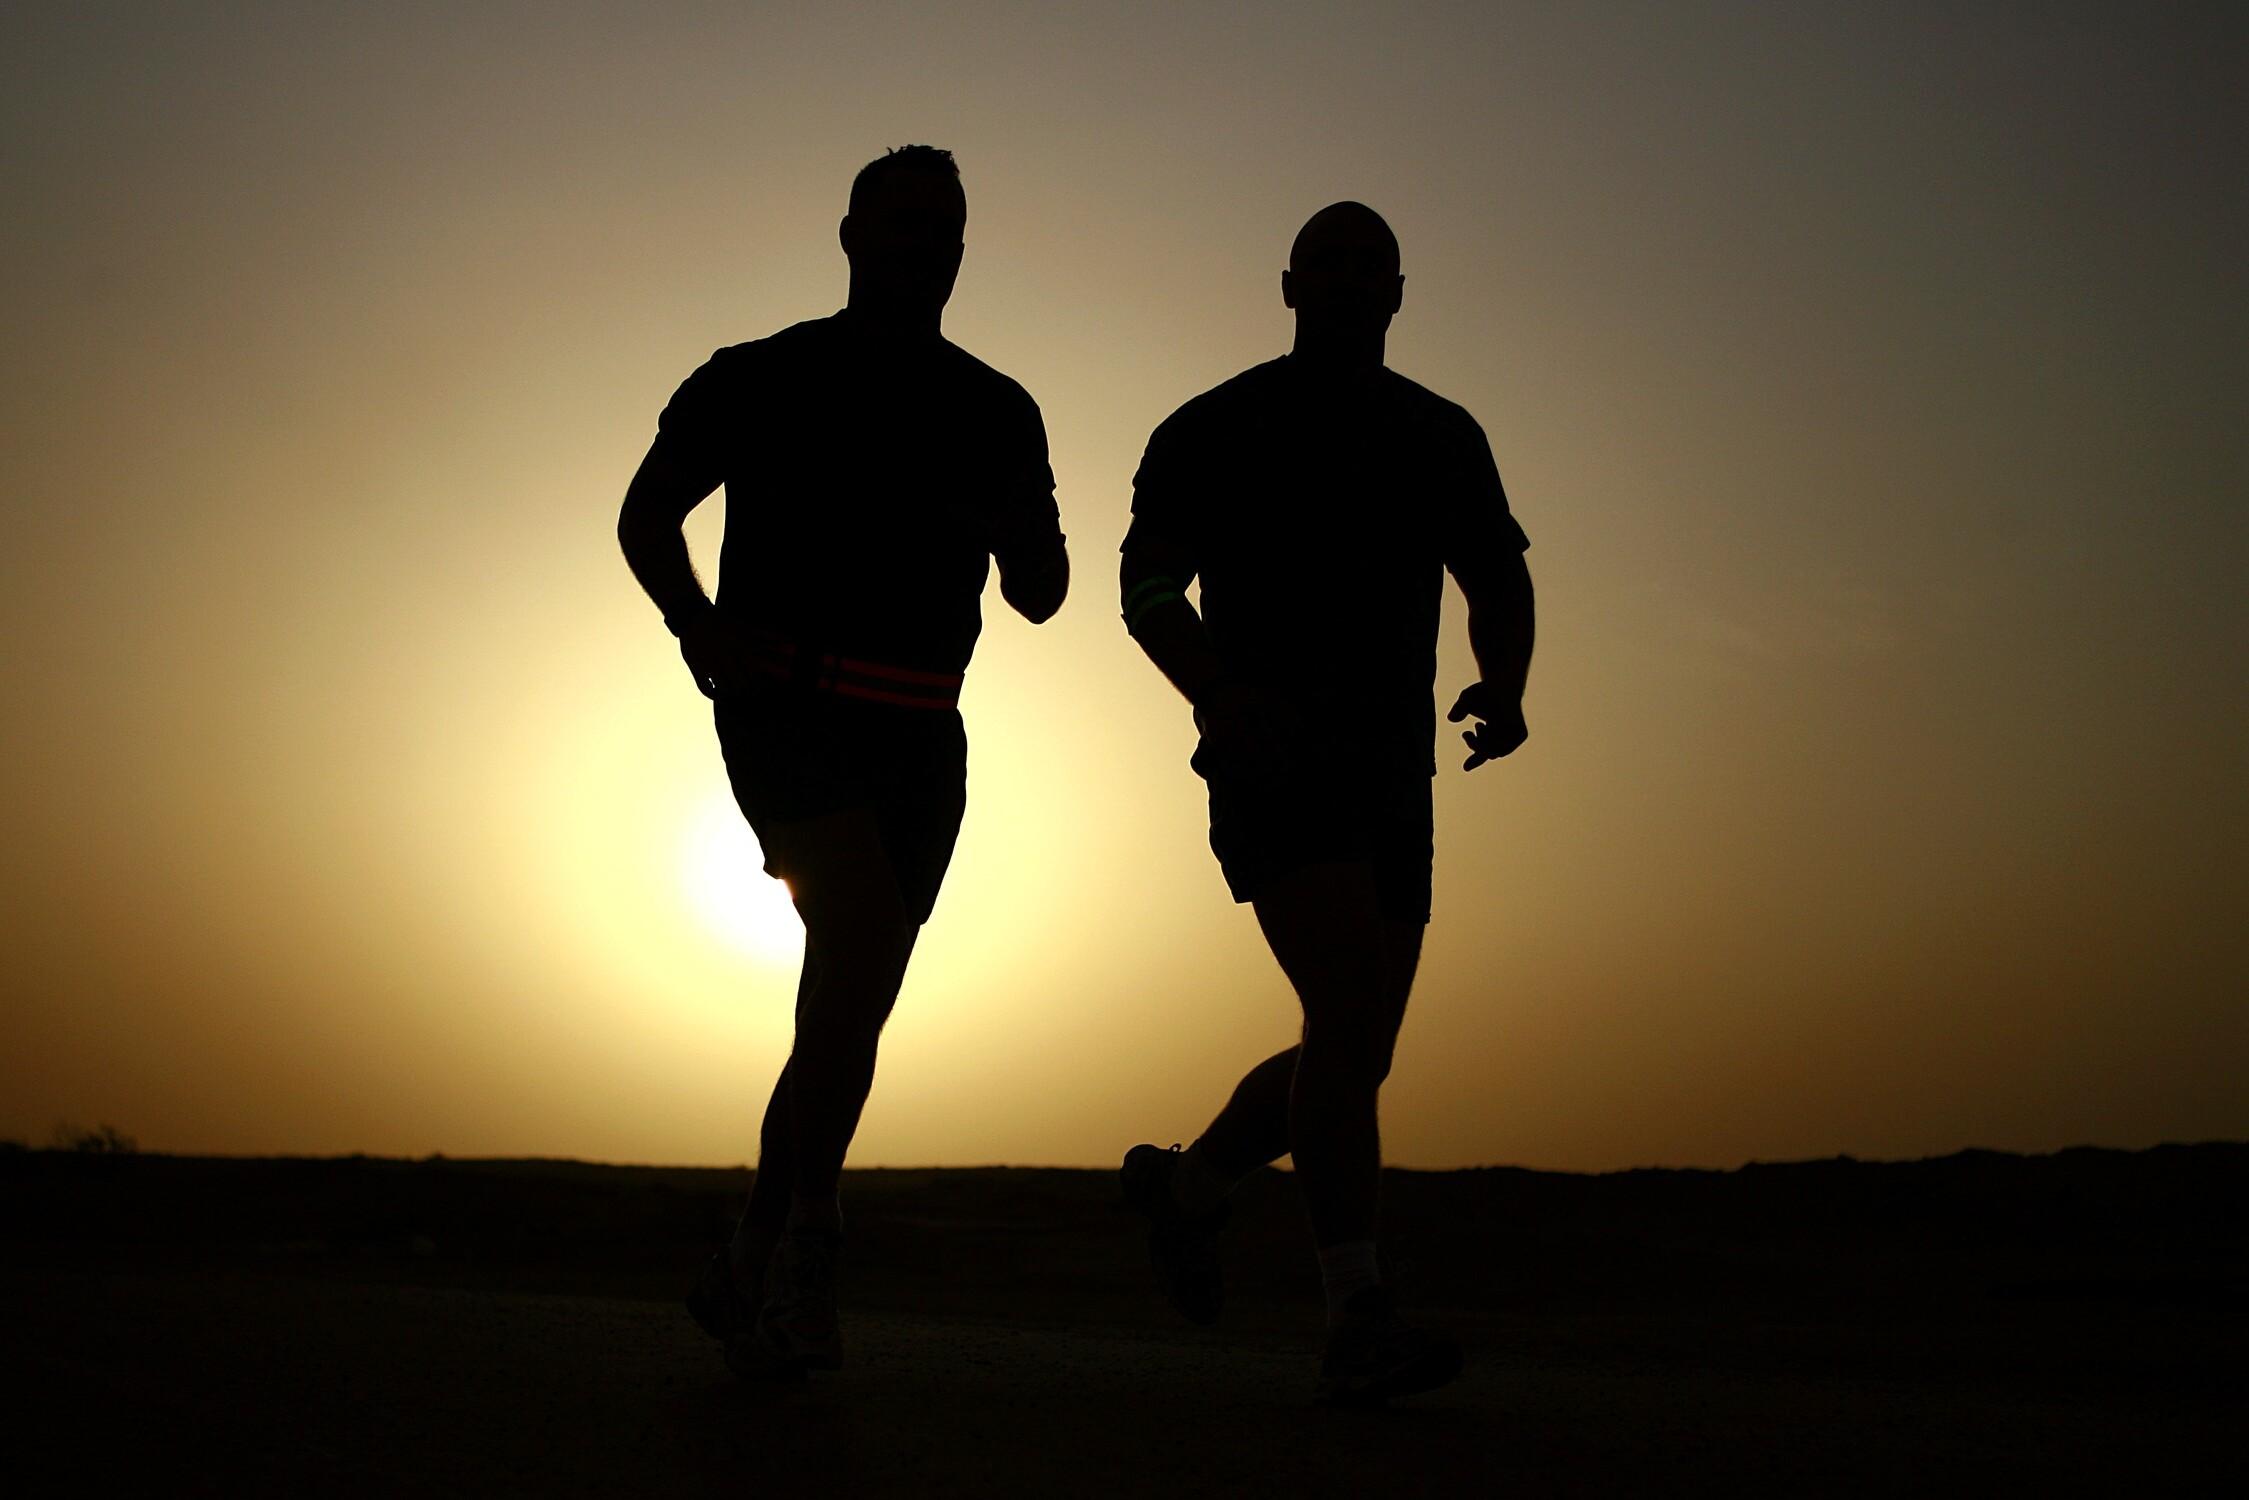 Does Excessive Sleep Raise Heart Disease Risk in Athletes?